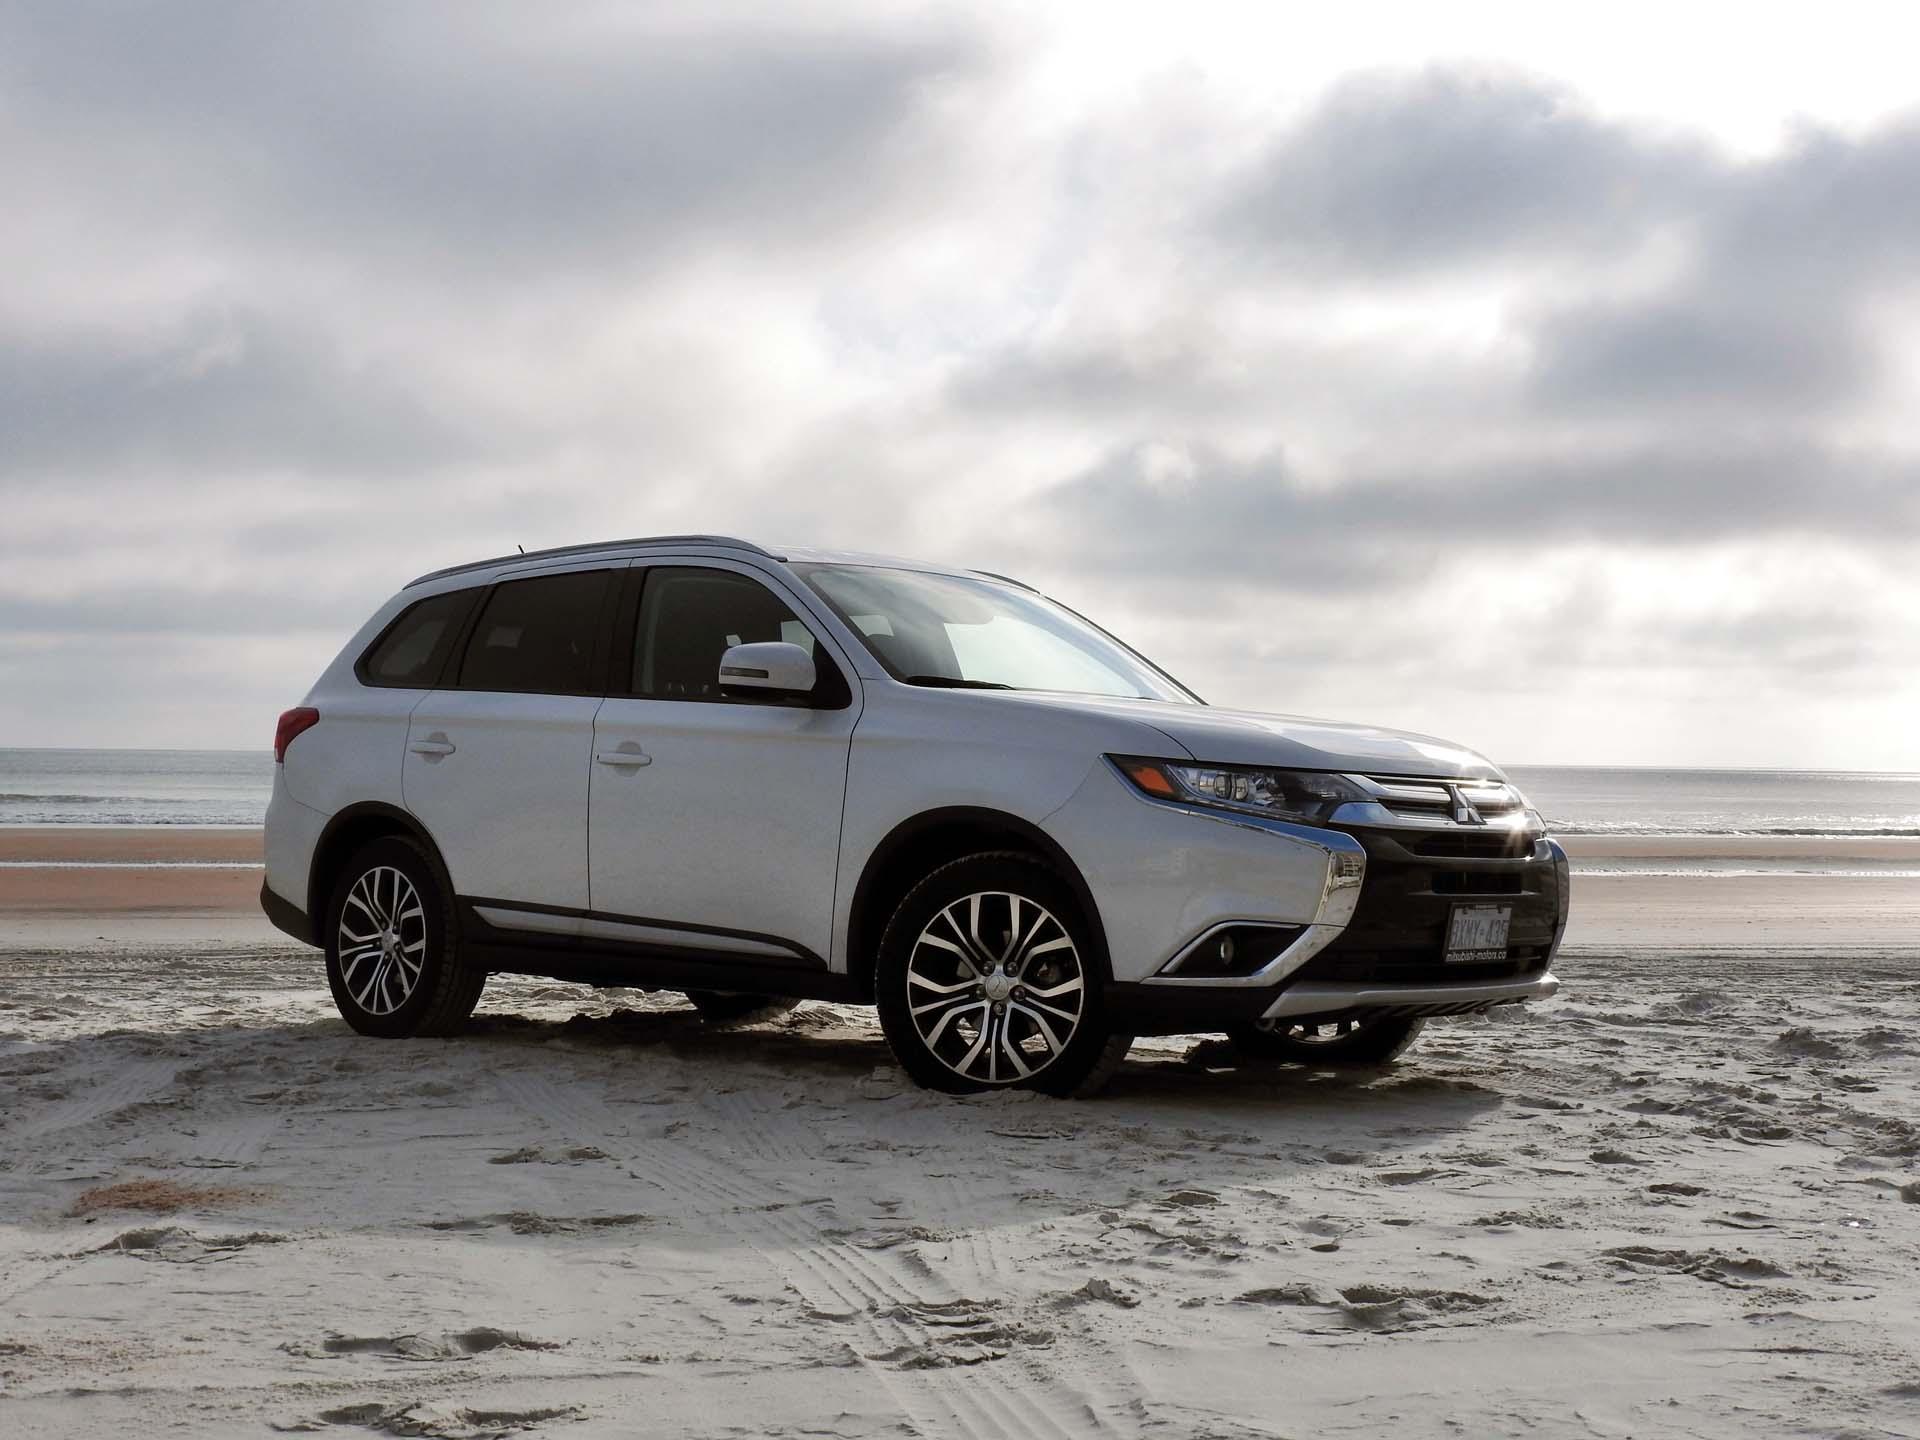 Used Vehicle Review: Mitsubishi Outlander, 2014 2018